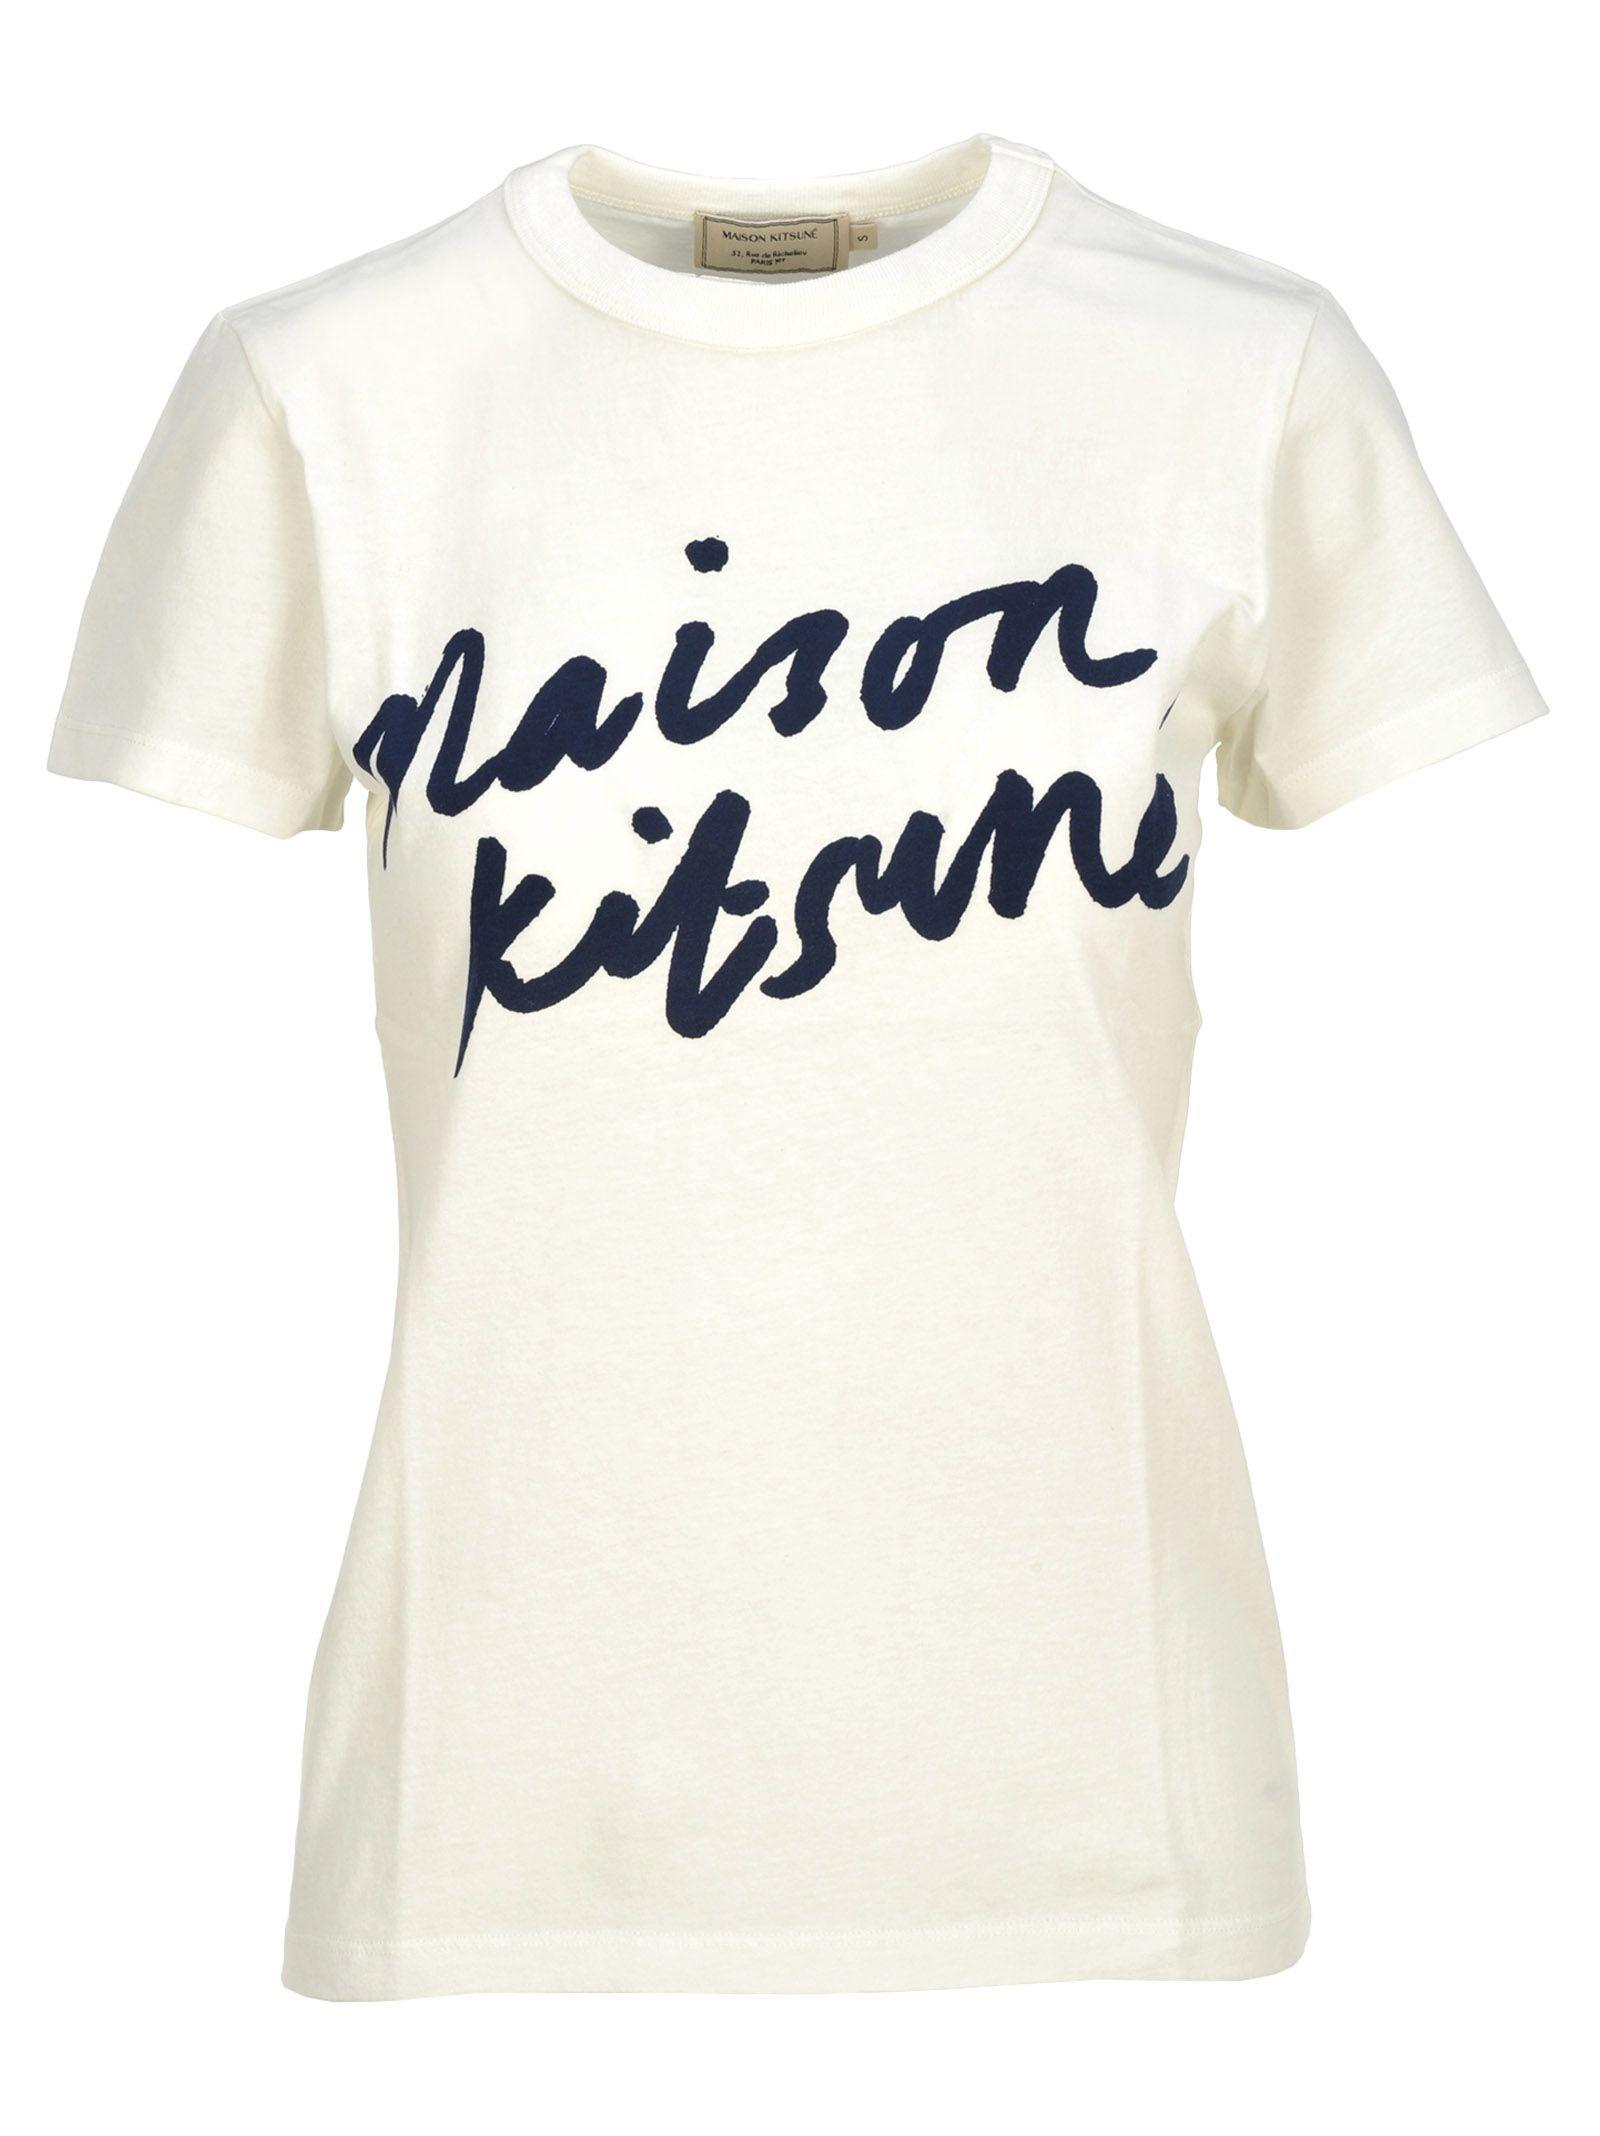 Kitsuné Handwriting Kitsune Tee Maison Shirt Milk Qhstrd